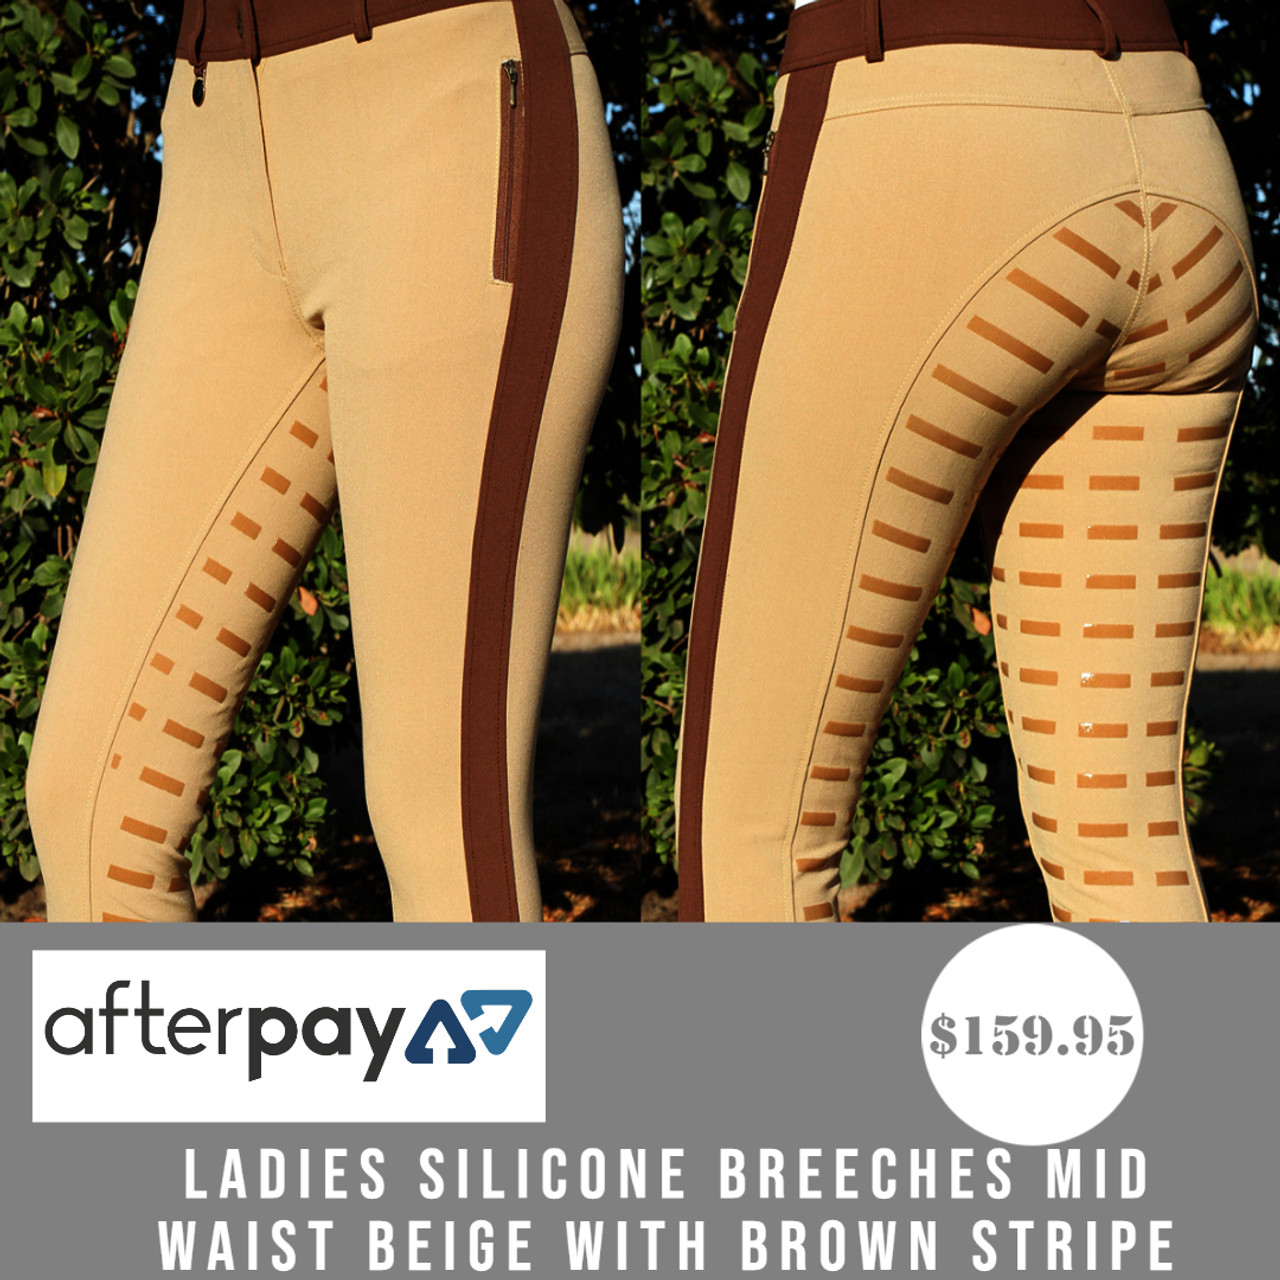 Ladies Silicone Breeches Mid Waist Beige With Brown Stripe